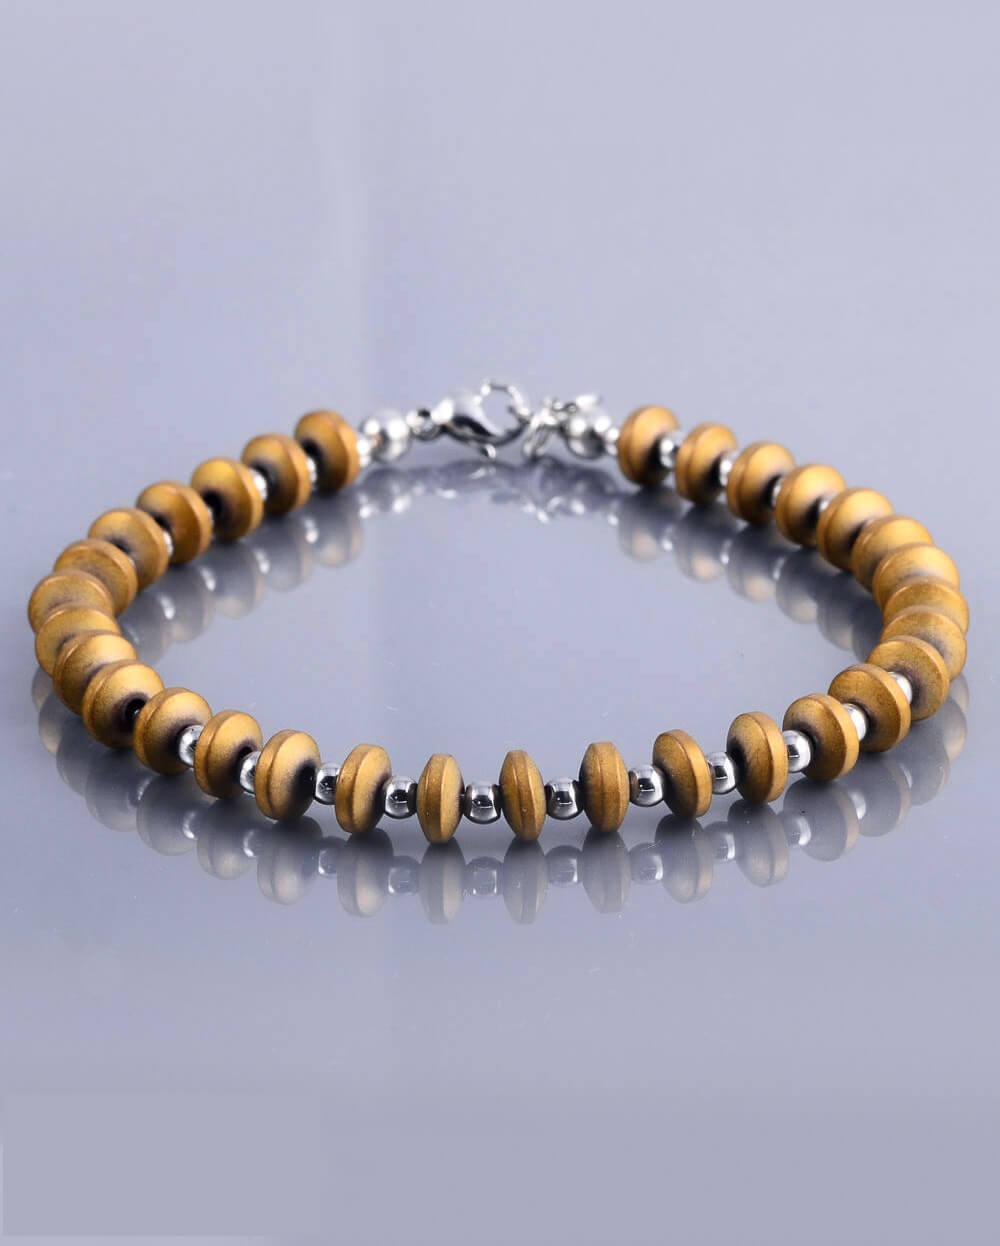 Special-Clasp-316L-Stainless-Steel-Charm-Bracelet-Men